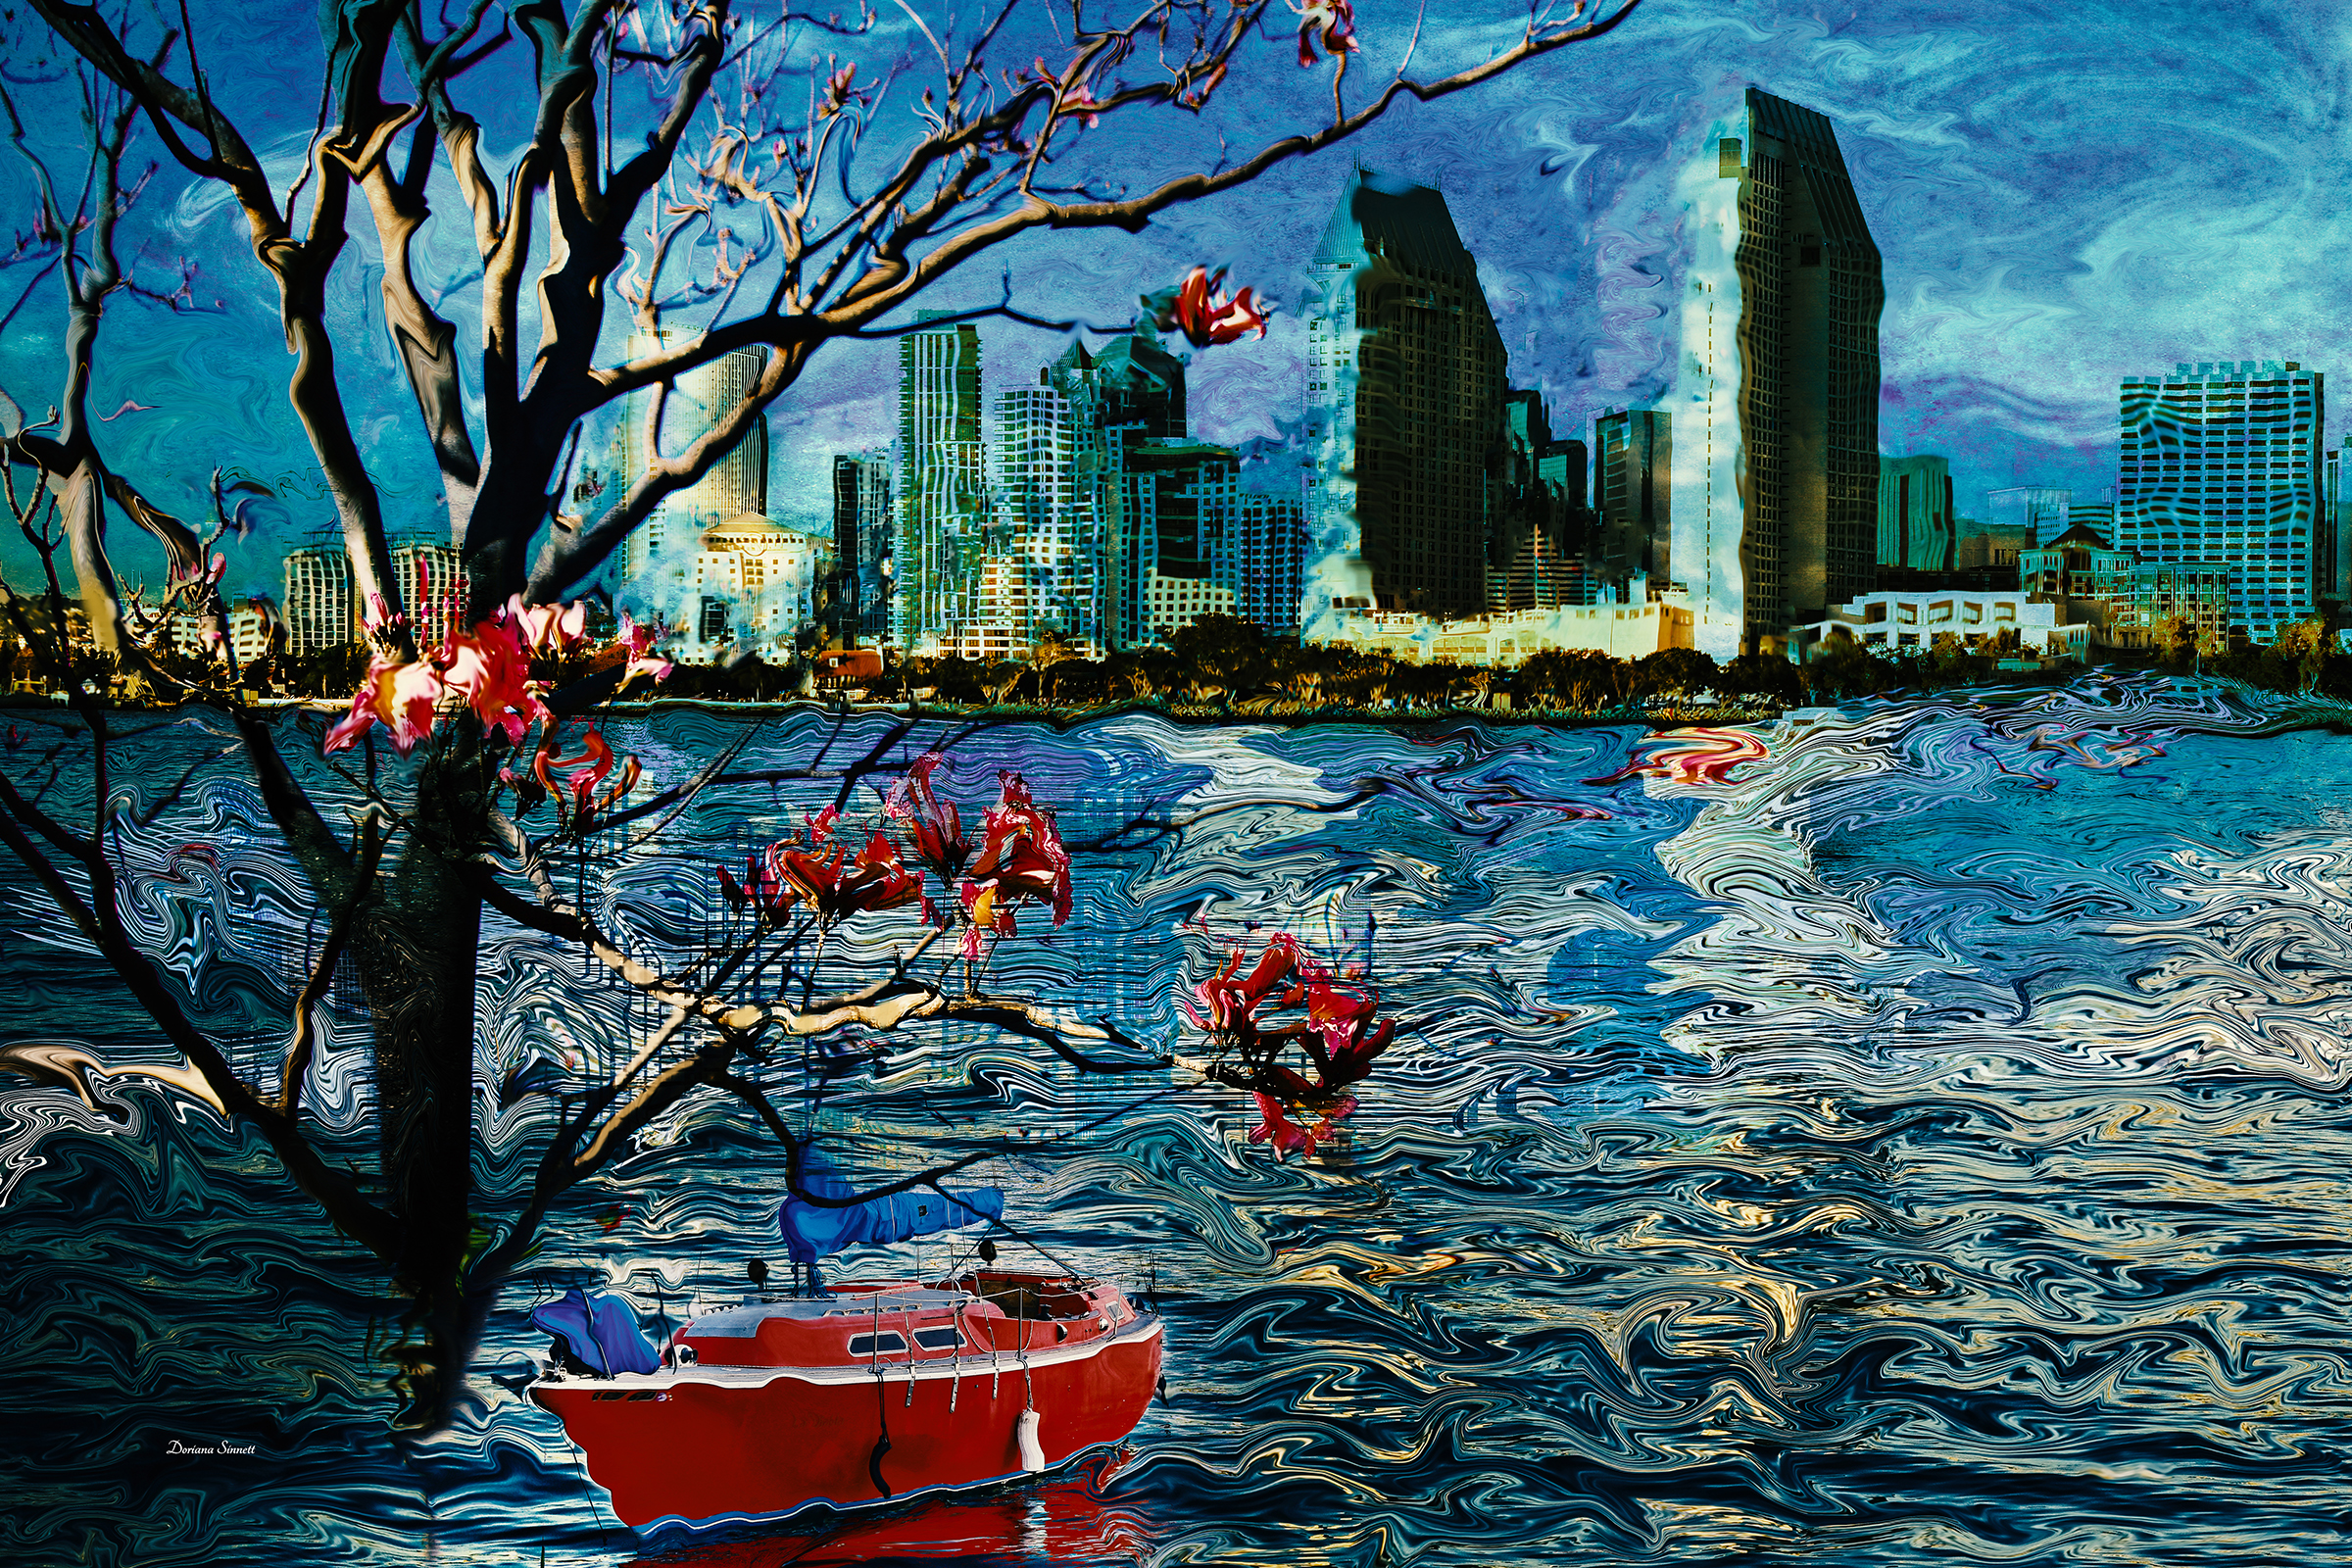 Red Boat… BUY   https://artboja.com/art/38vvy2/22205.php